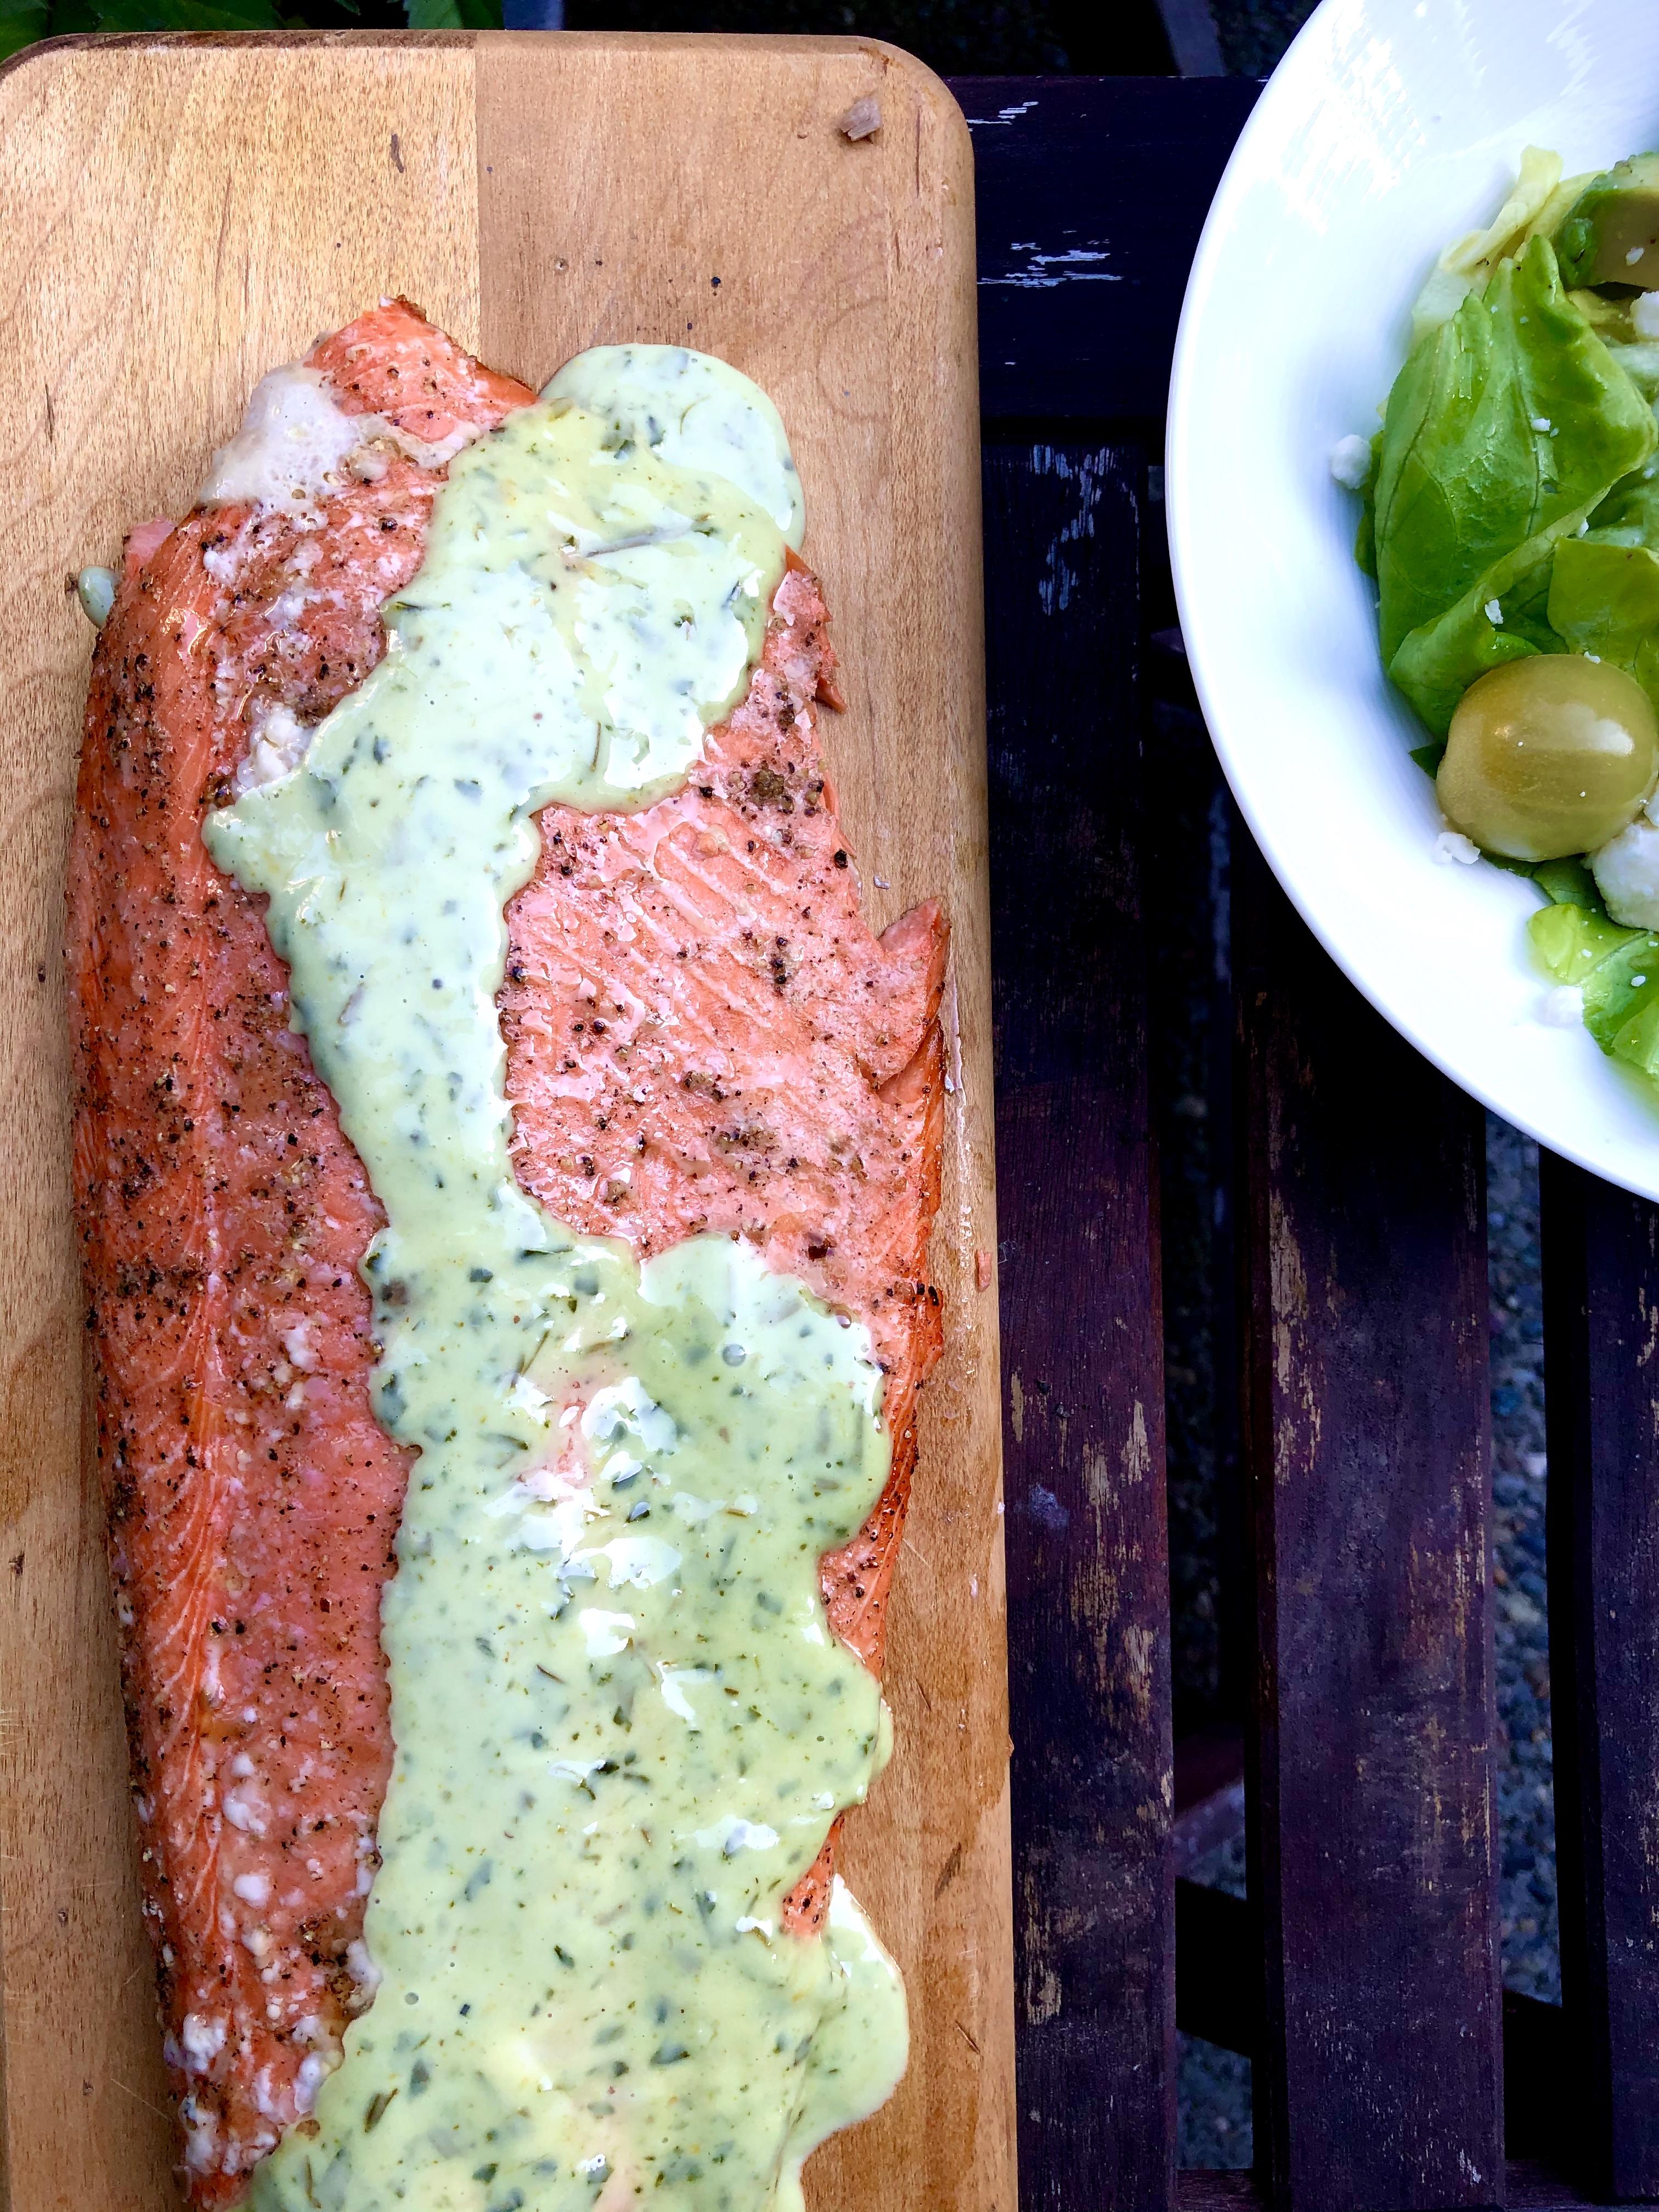 Bristol Bay Wild Salmon Filets - Shipped to You